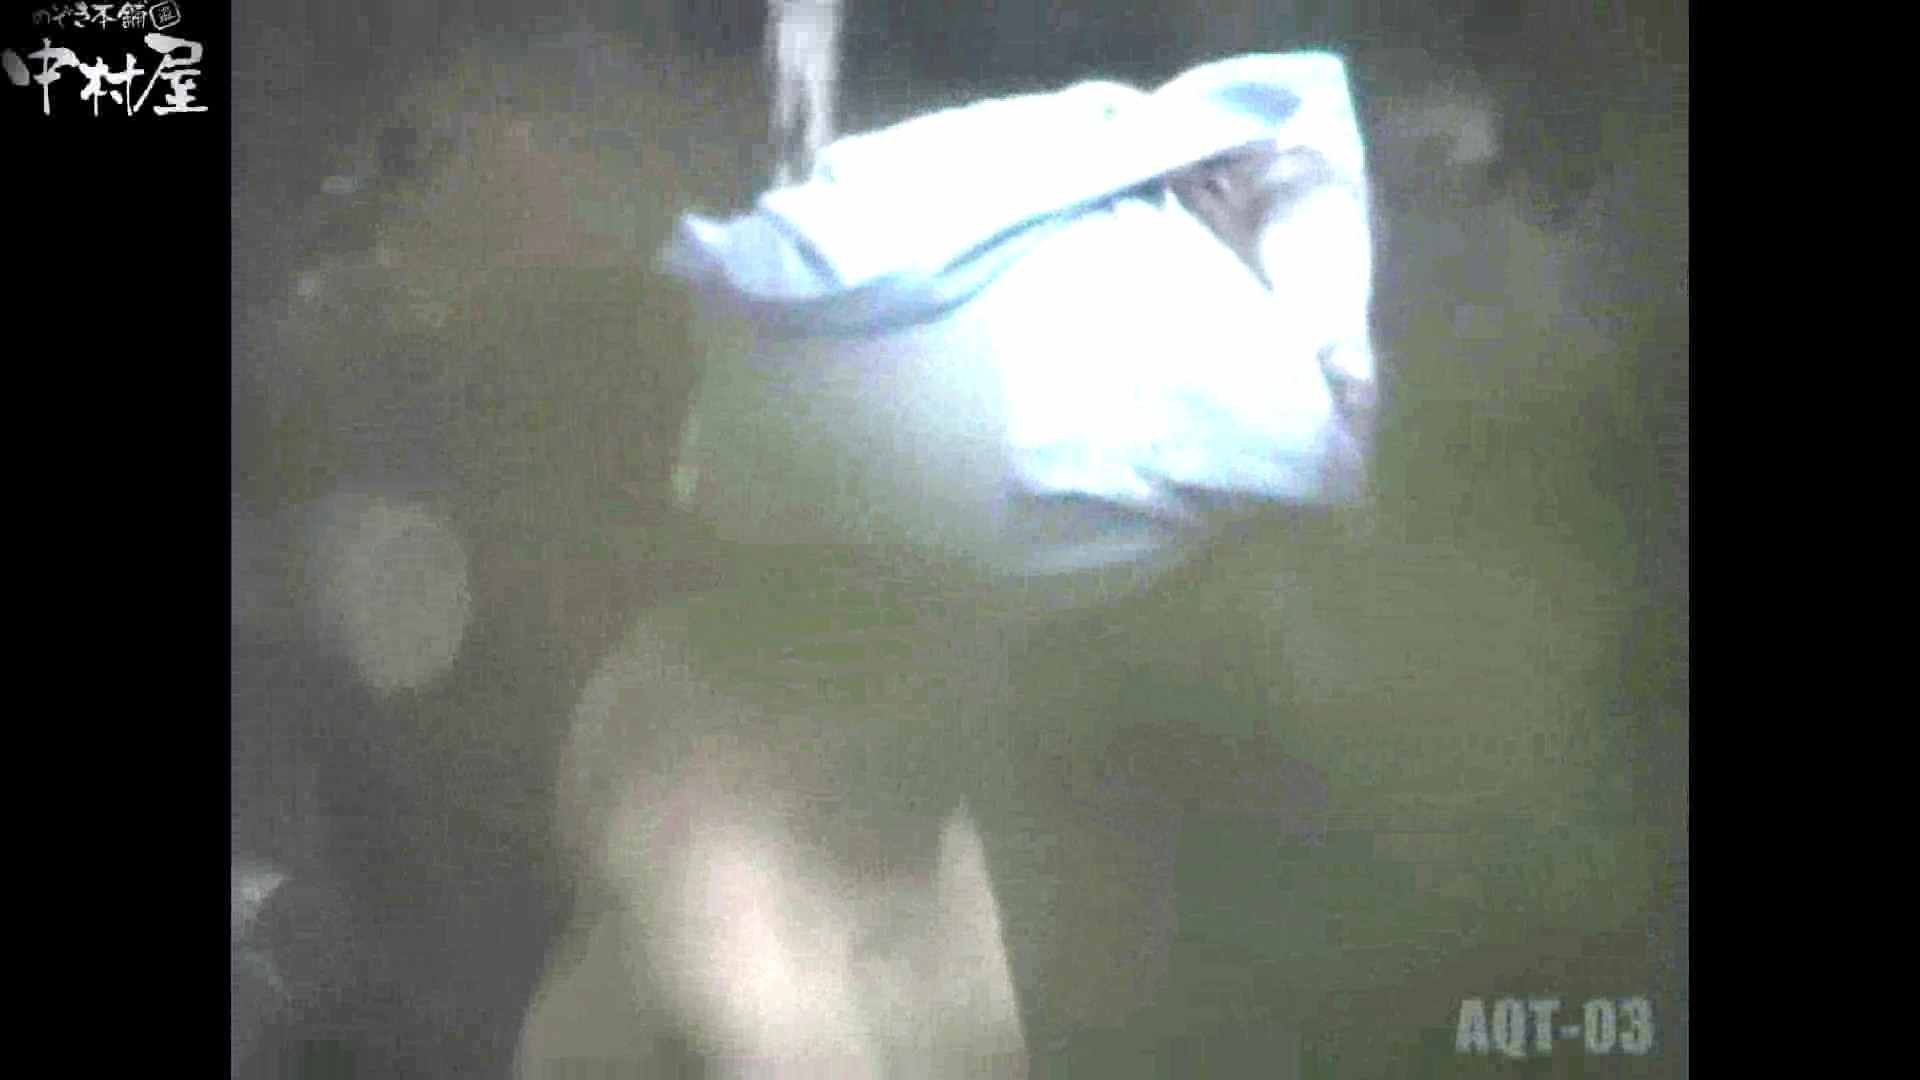 Aquaな露天風呂Vol.867潜入盗撮露天風呂参判湯 其の七 潜入 覗き性交動画流出 83連発 39